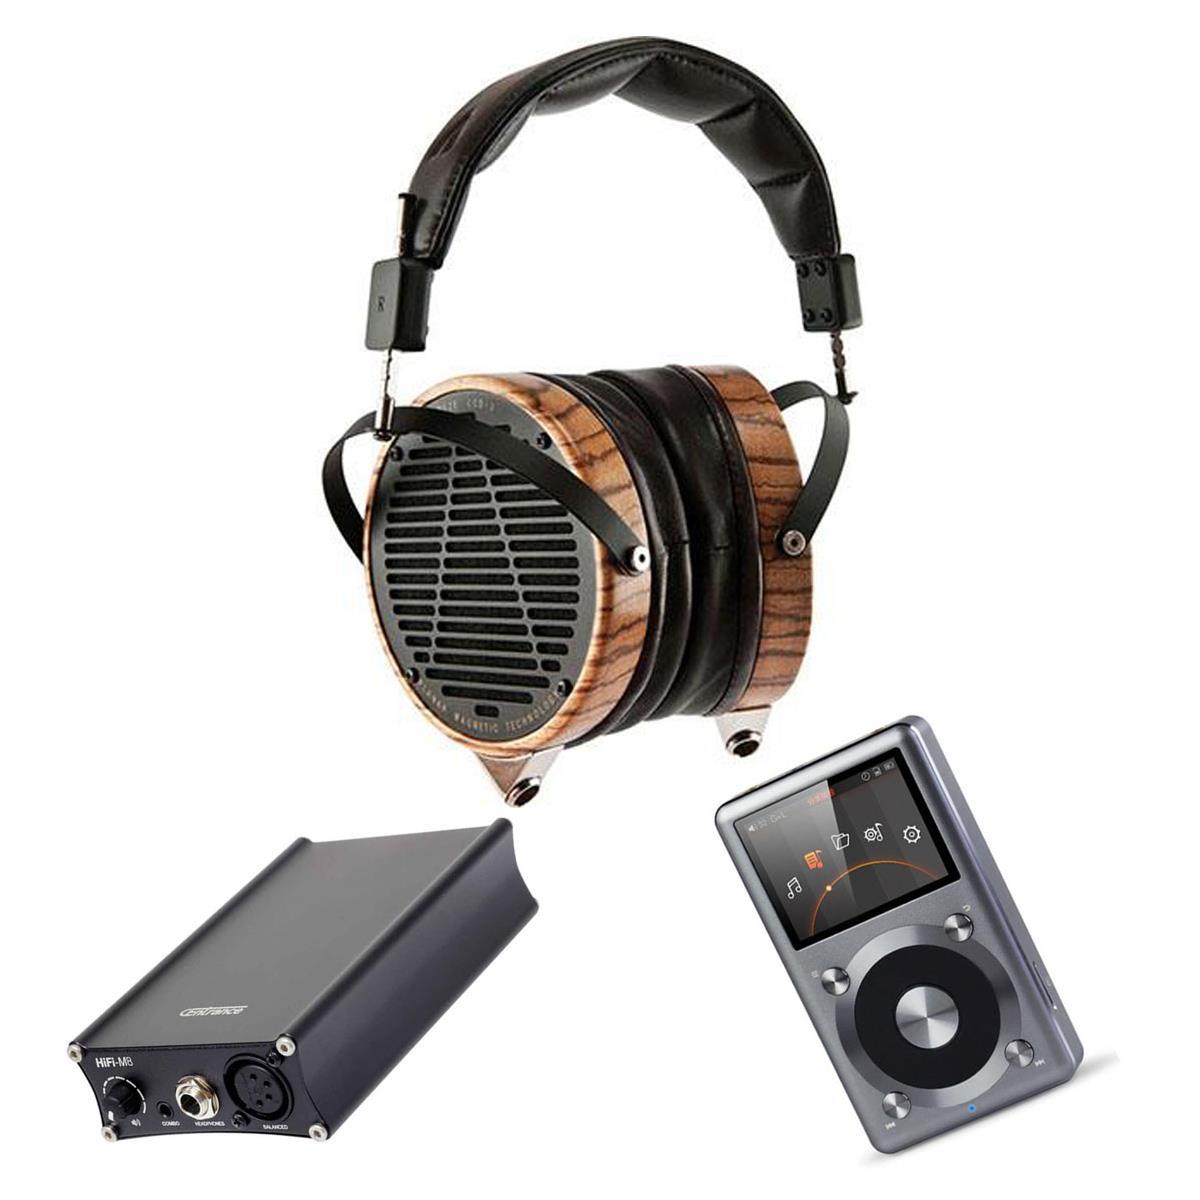 Audeze LCD-3 Planar Magnetic Headphones + Centrance HIFI-M8 XL4 Balanced Amp/Dac + FiiO X3 $1945 + free shipping